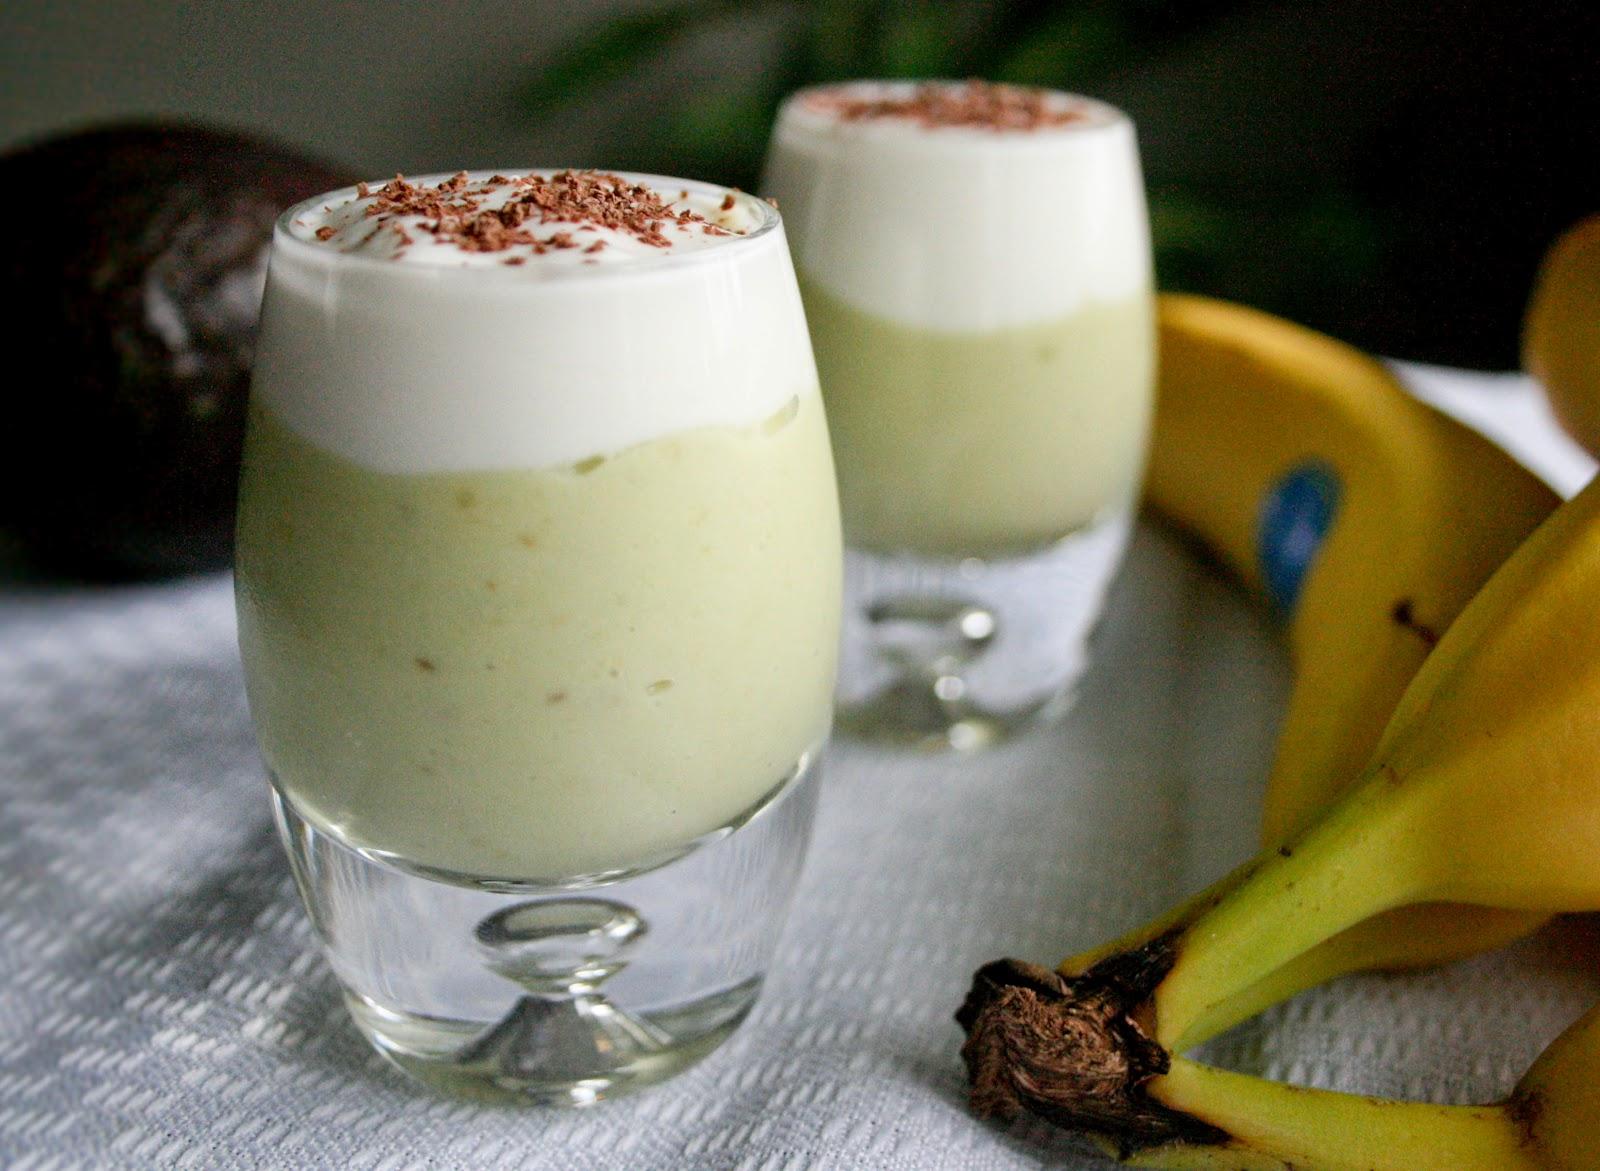 avocado and banana smoothie shooters 1 banana 1 avocado 3